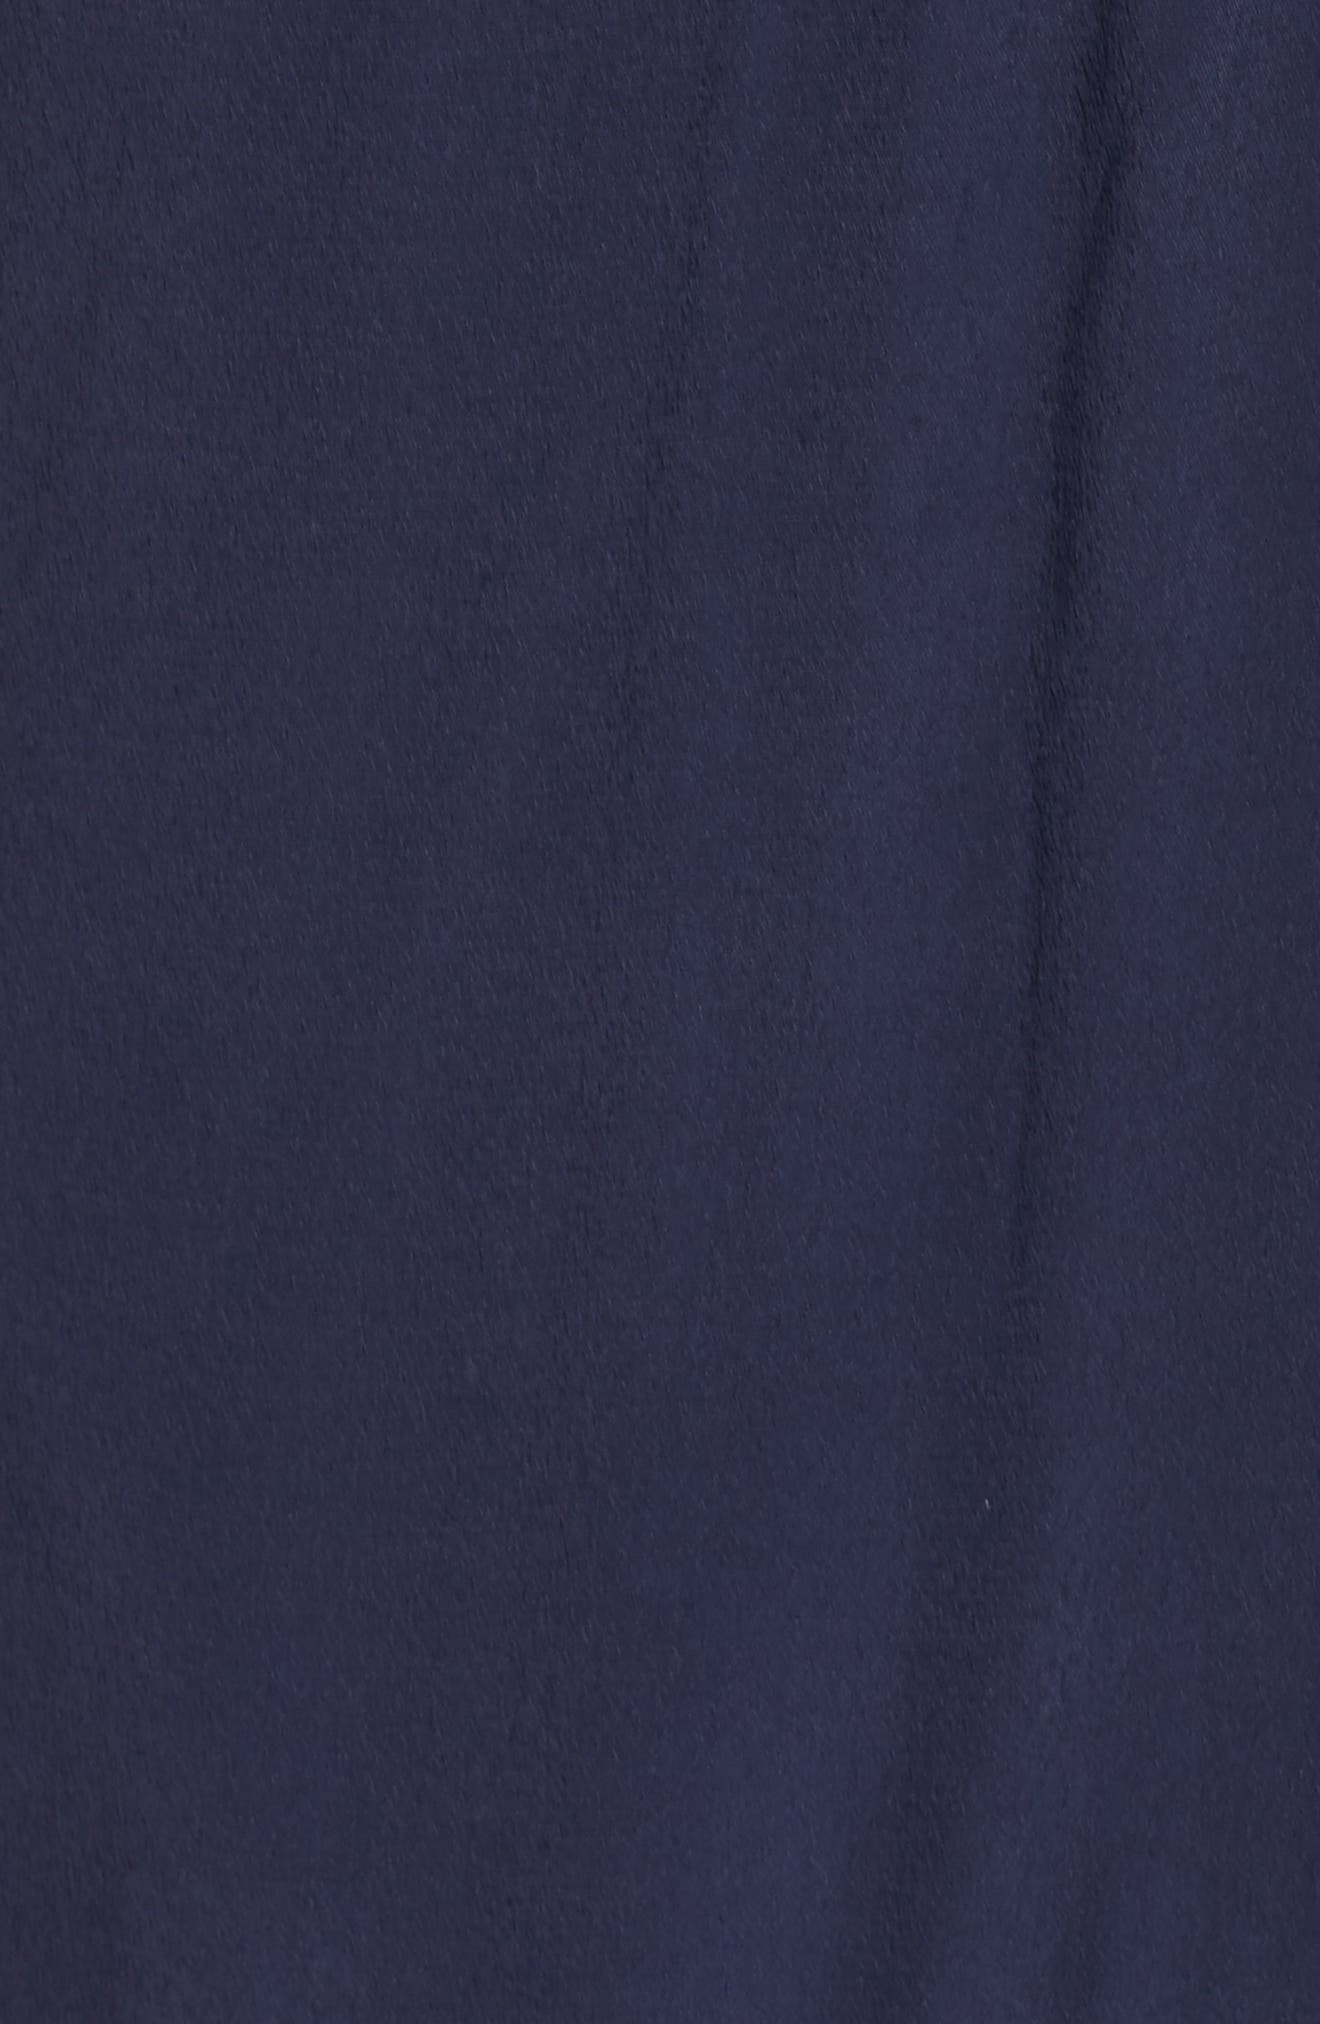 Cold Shoulder Maxi Dress,                             Alternate thumbnail 5, color,                             NAVY